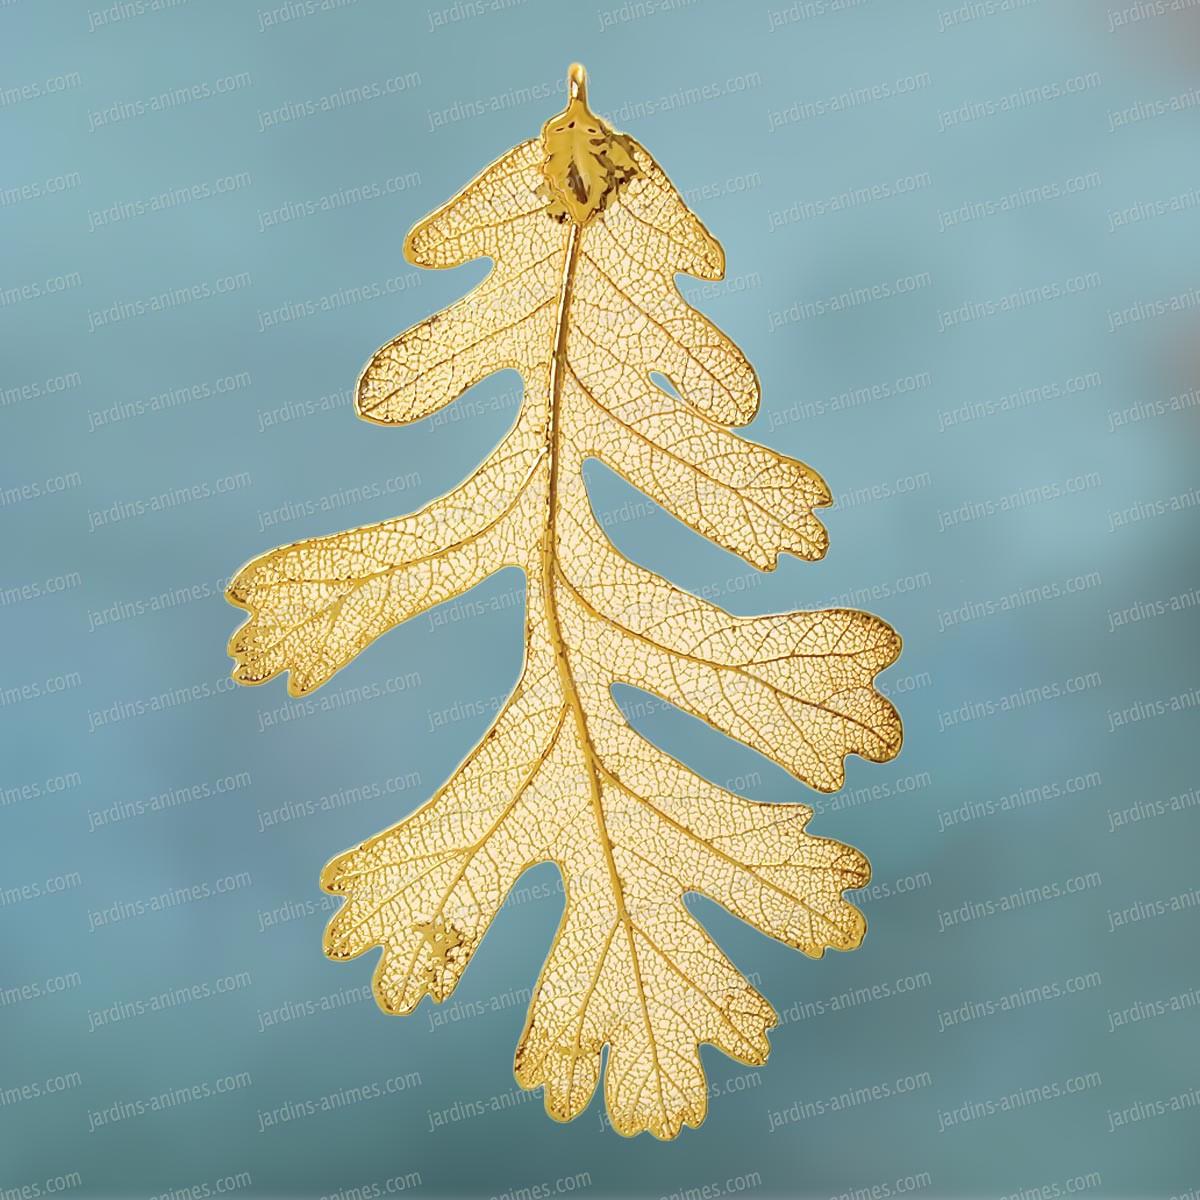 300 feuilles d/'or 24 carats